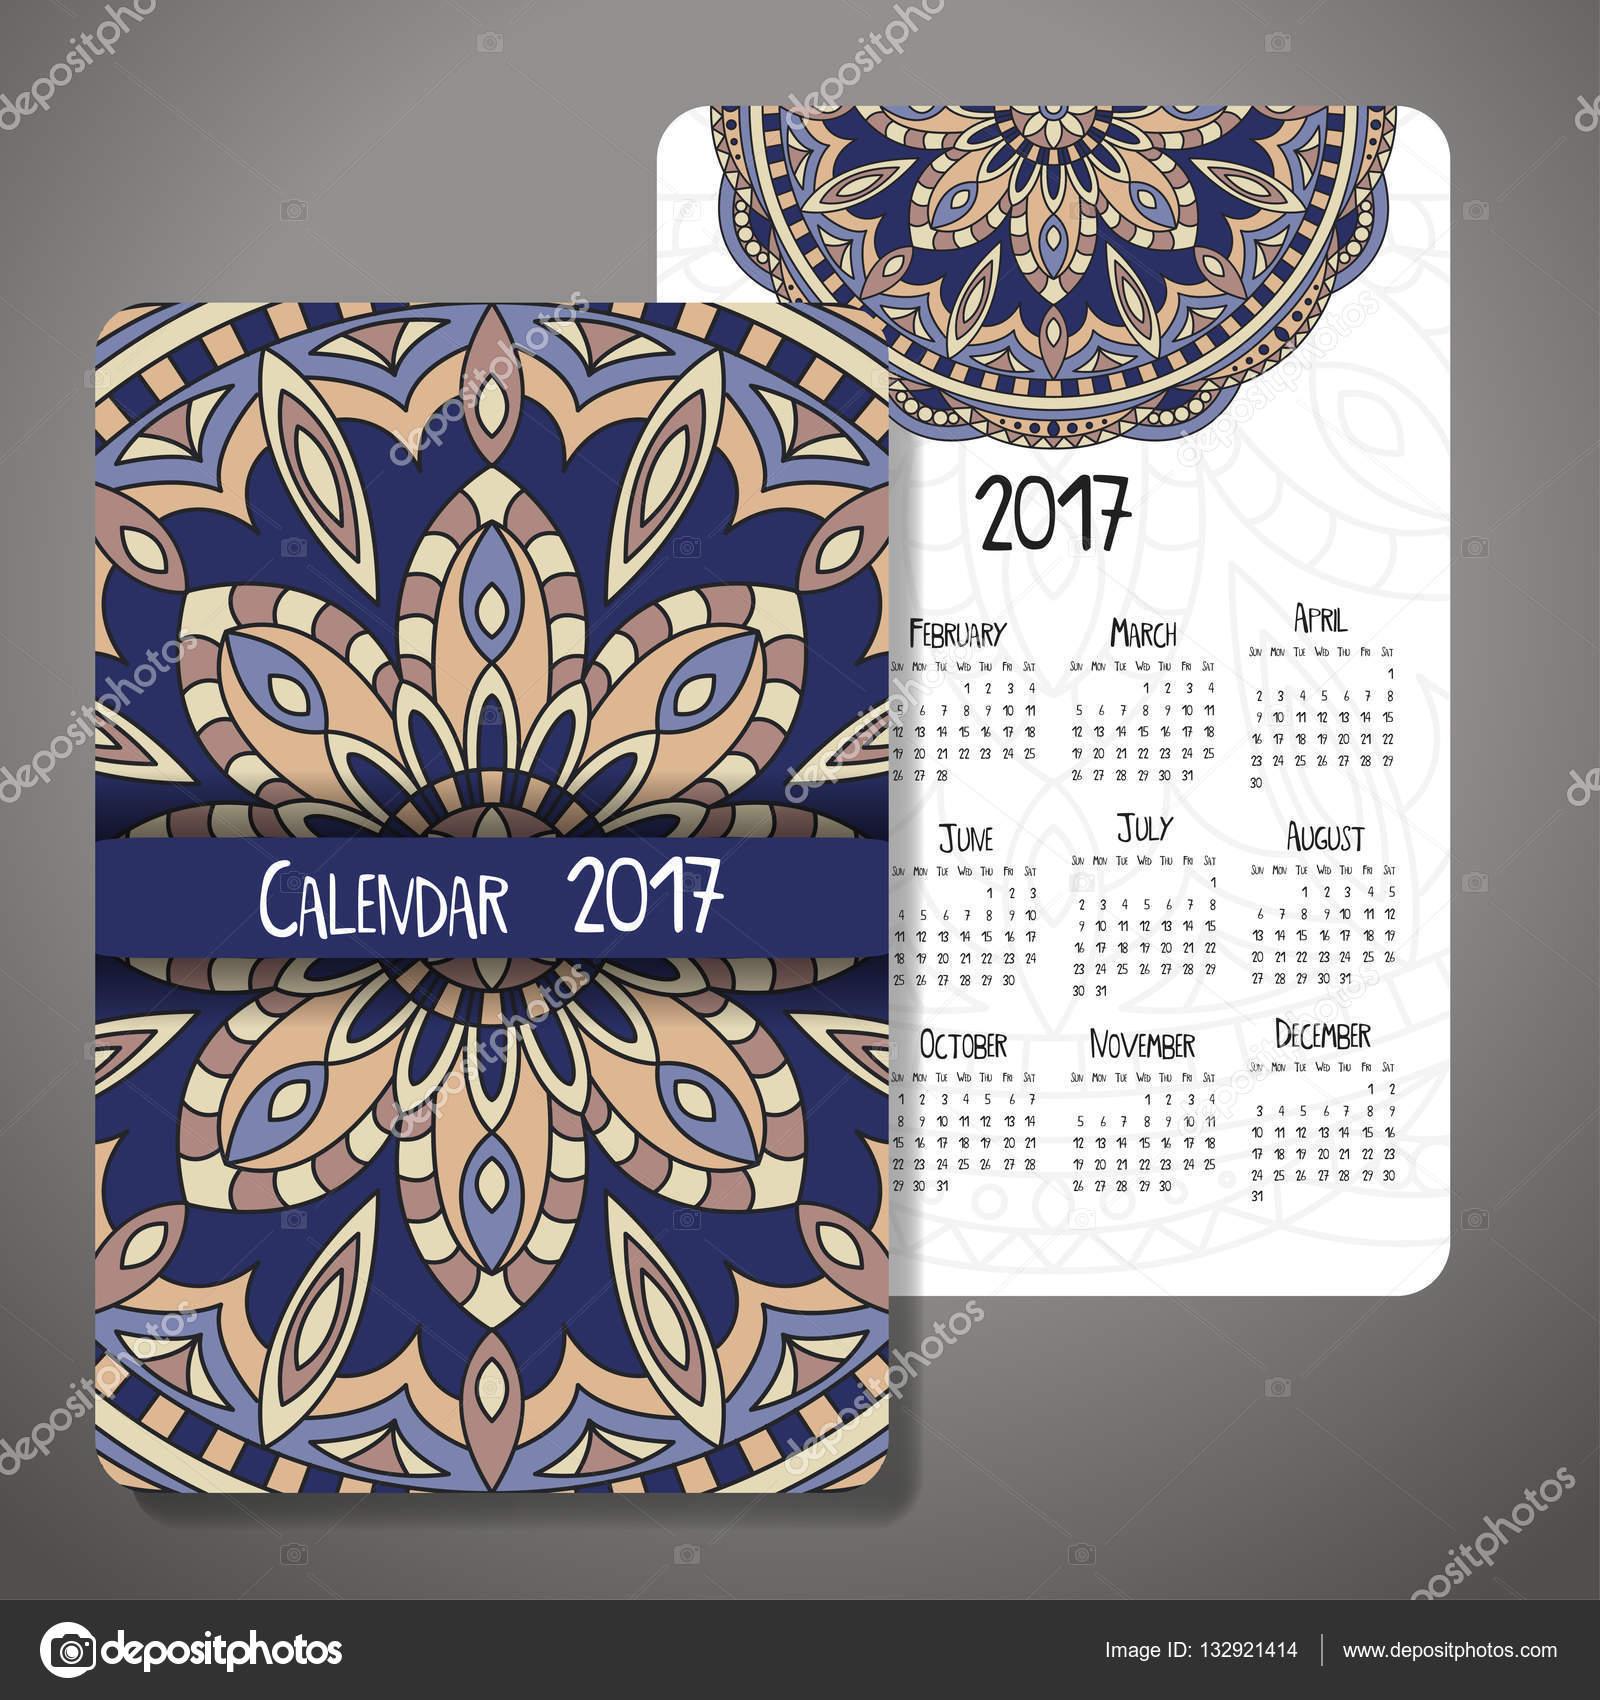 Decoraci n vintage calendario 2017 modelo oriental for Adornos navidenos 2017 trackid sp 006